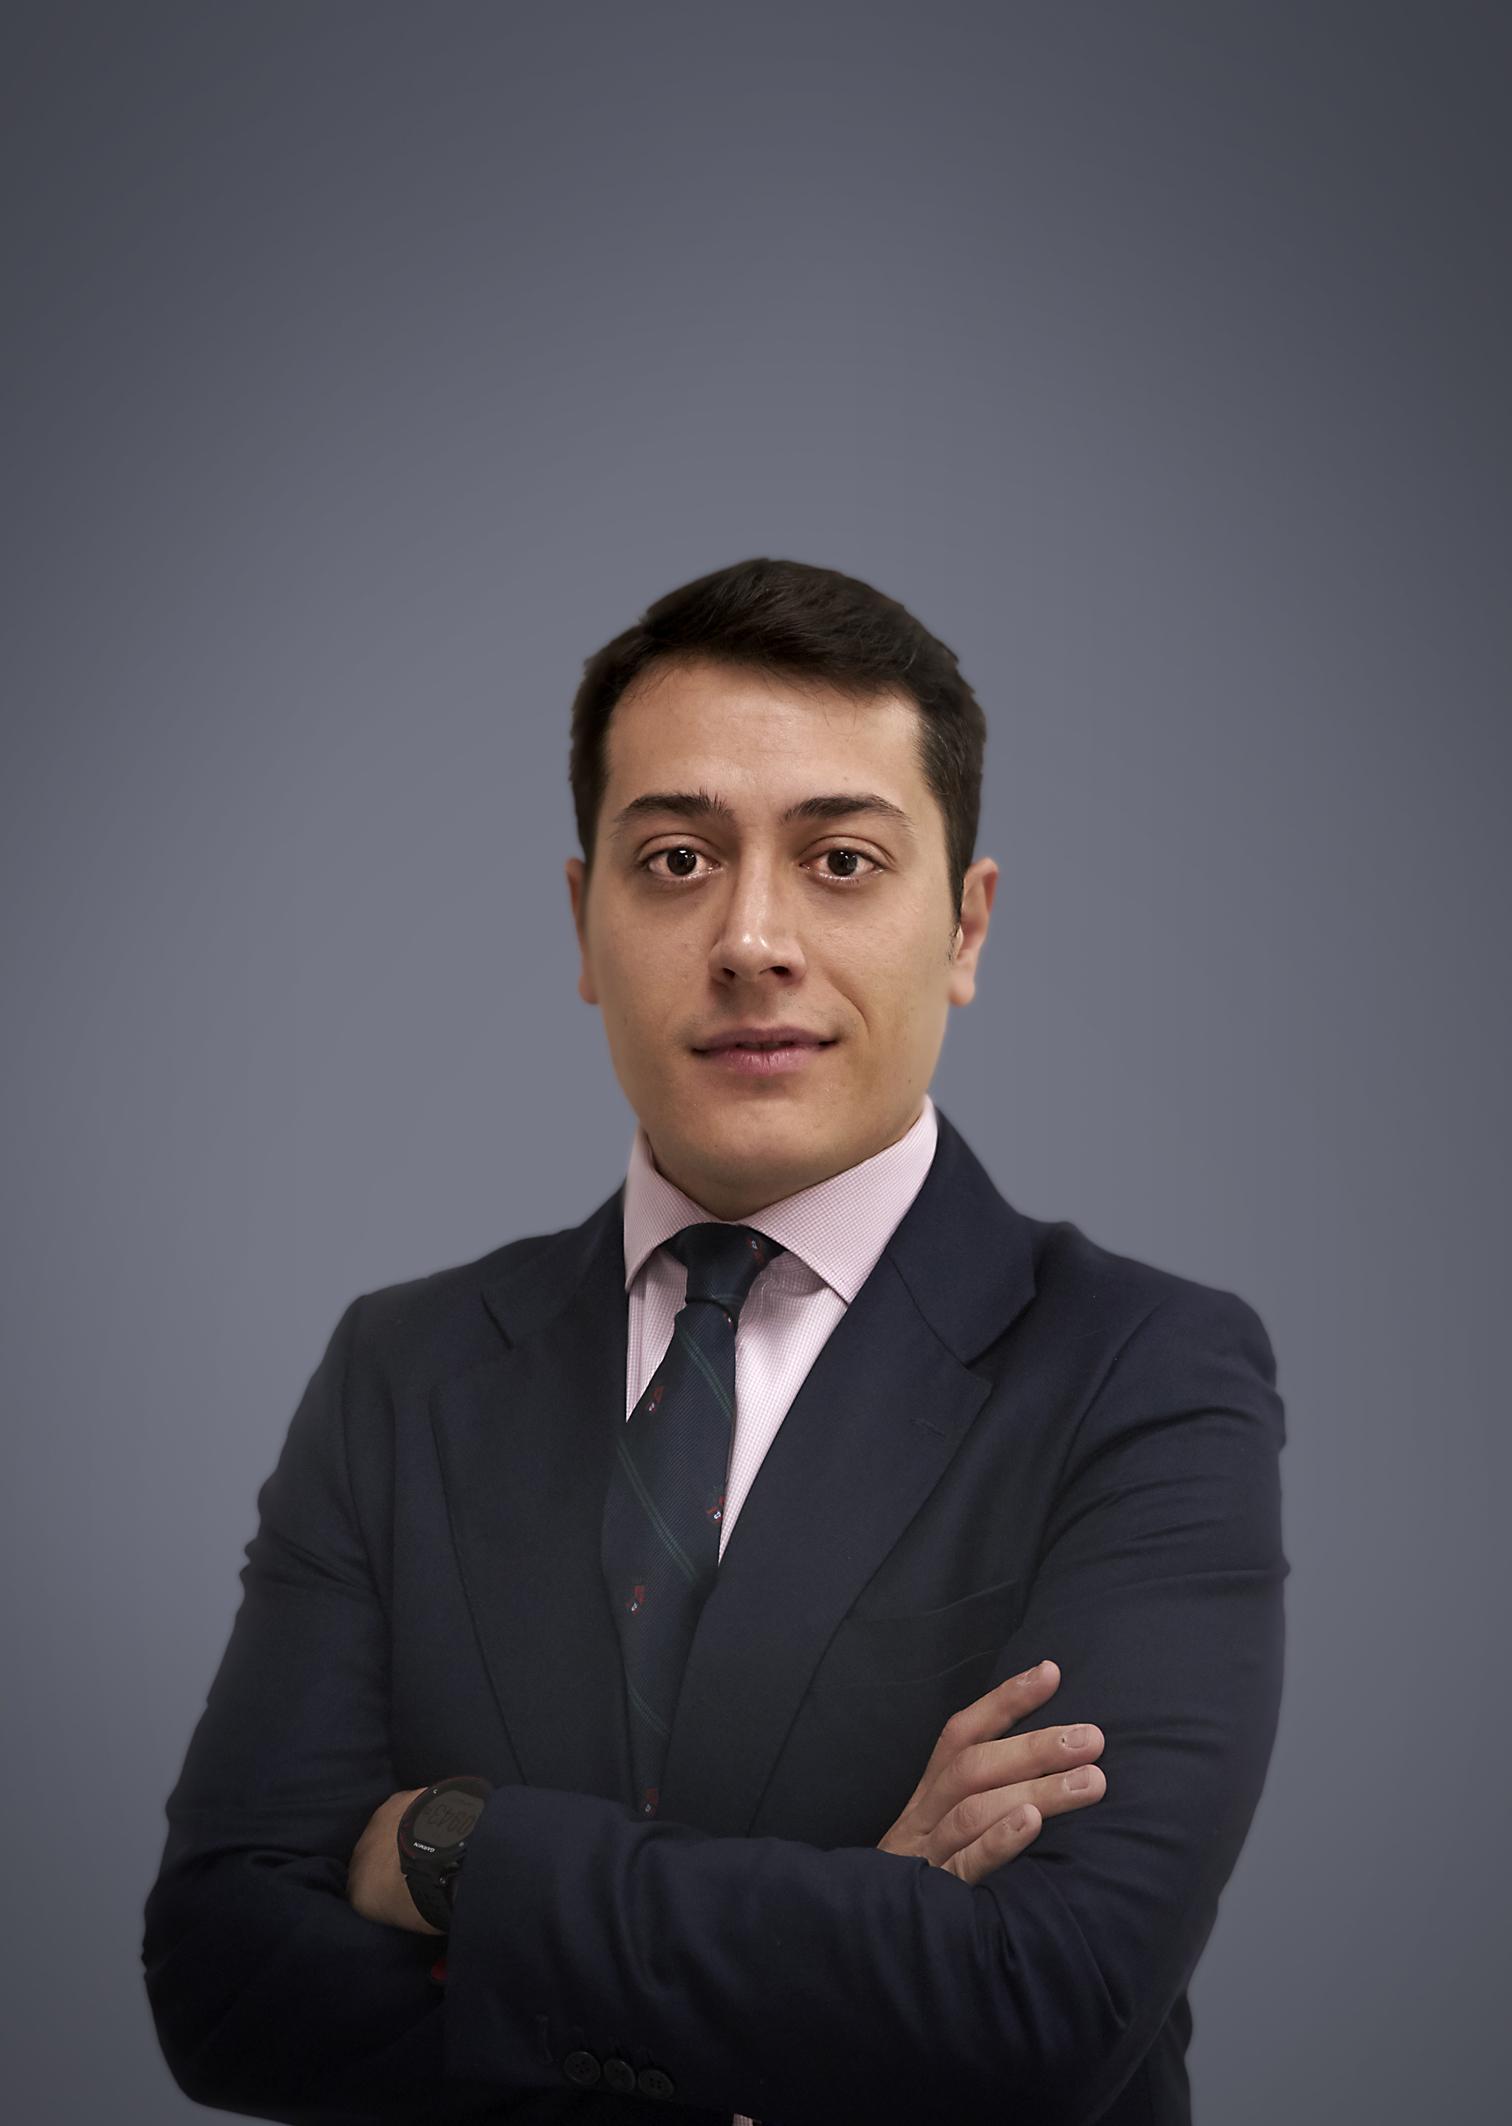 José Arolas Lloris